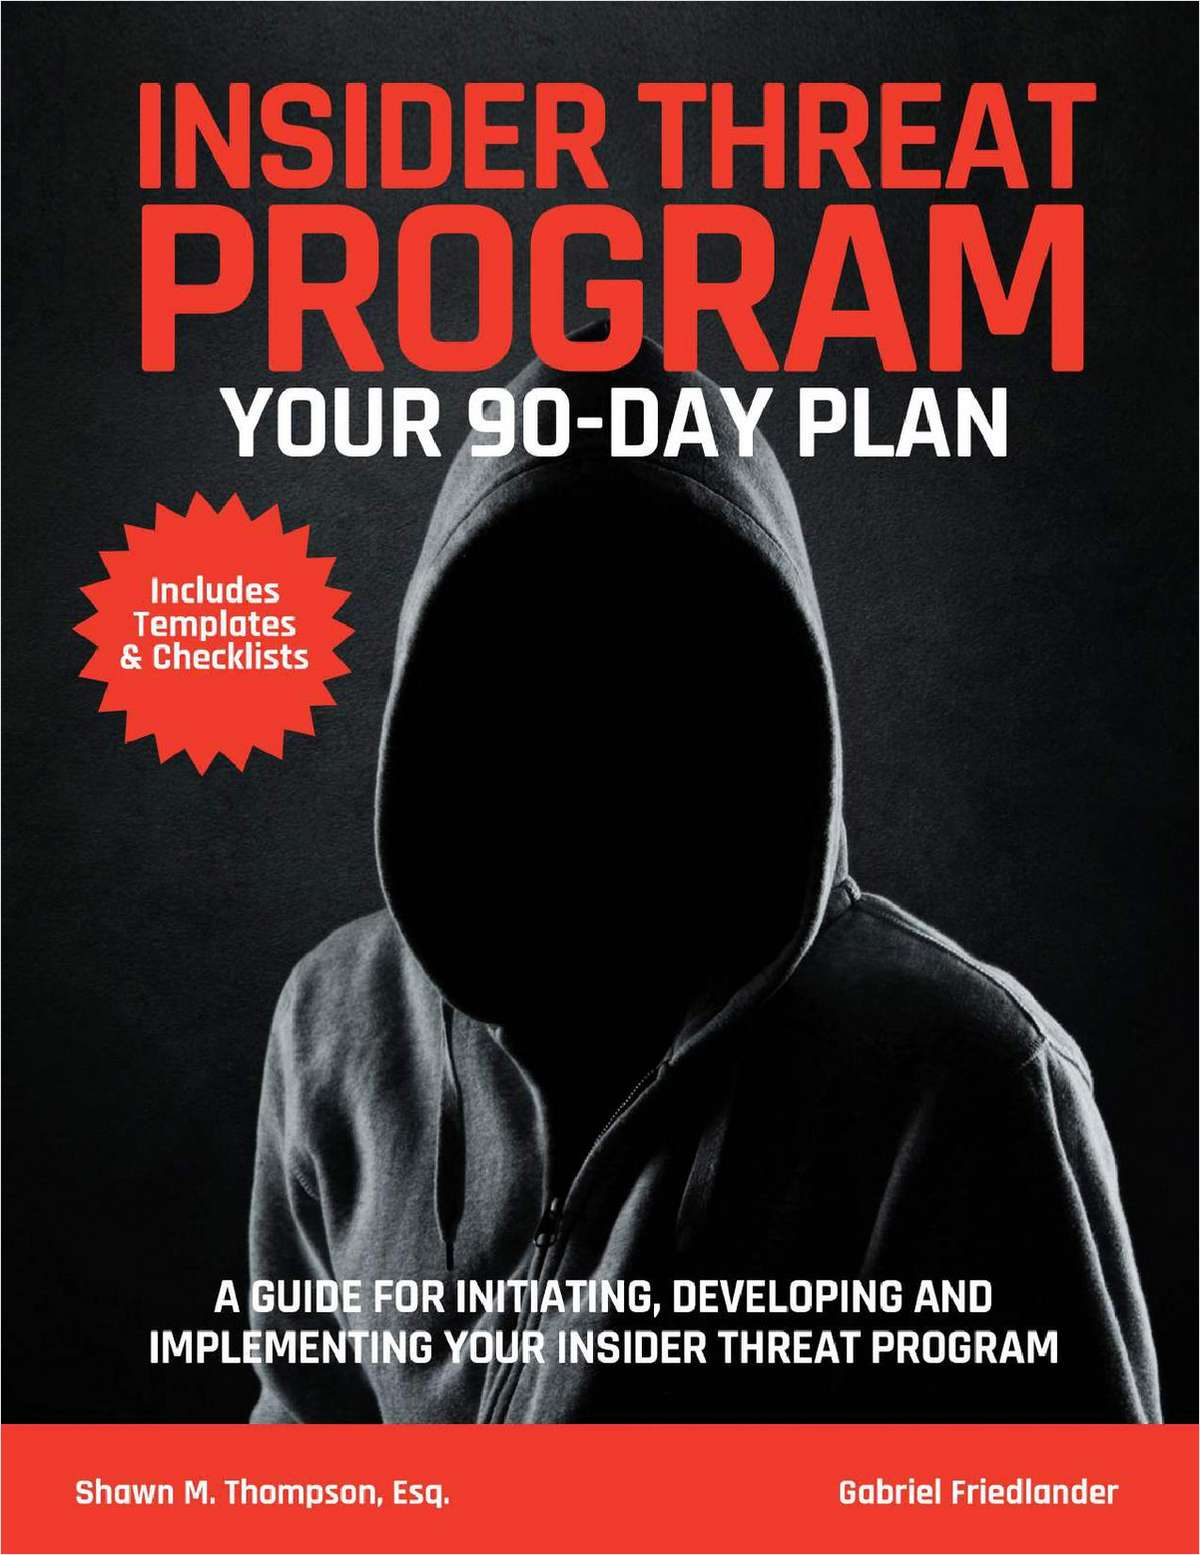 Build An Insider Threat Program in 90 Days